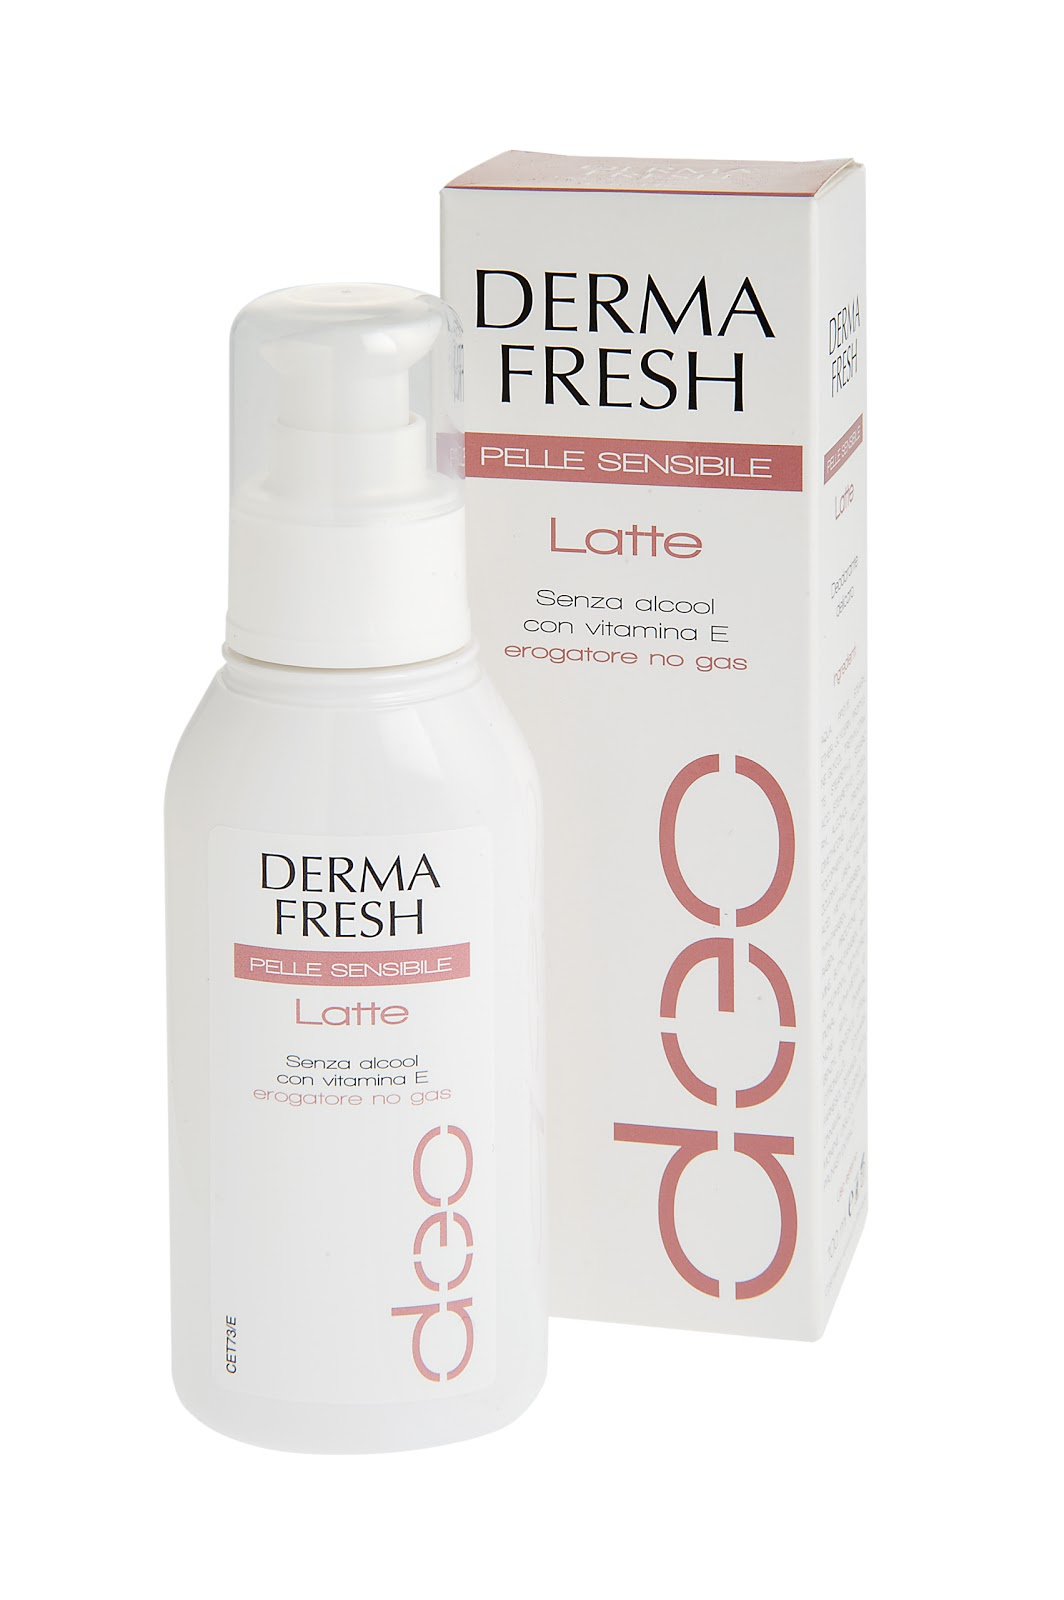 deodorant brands